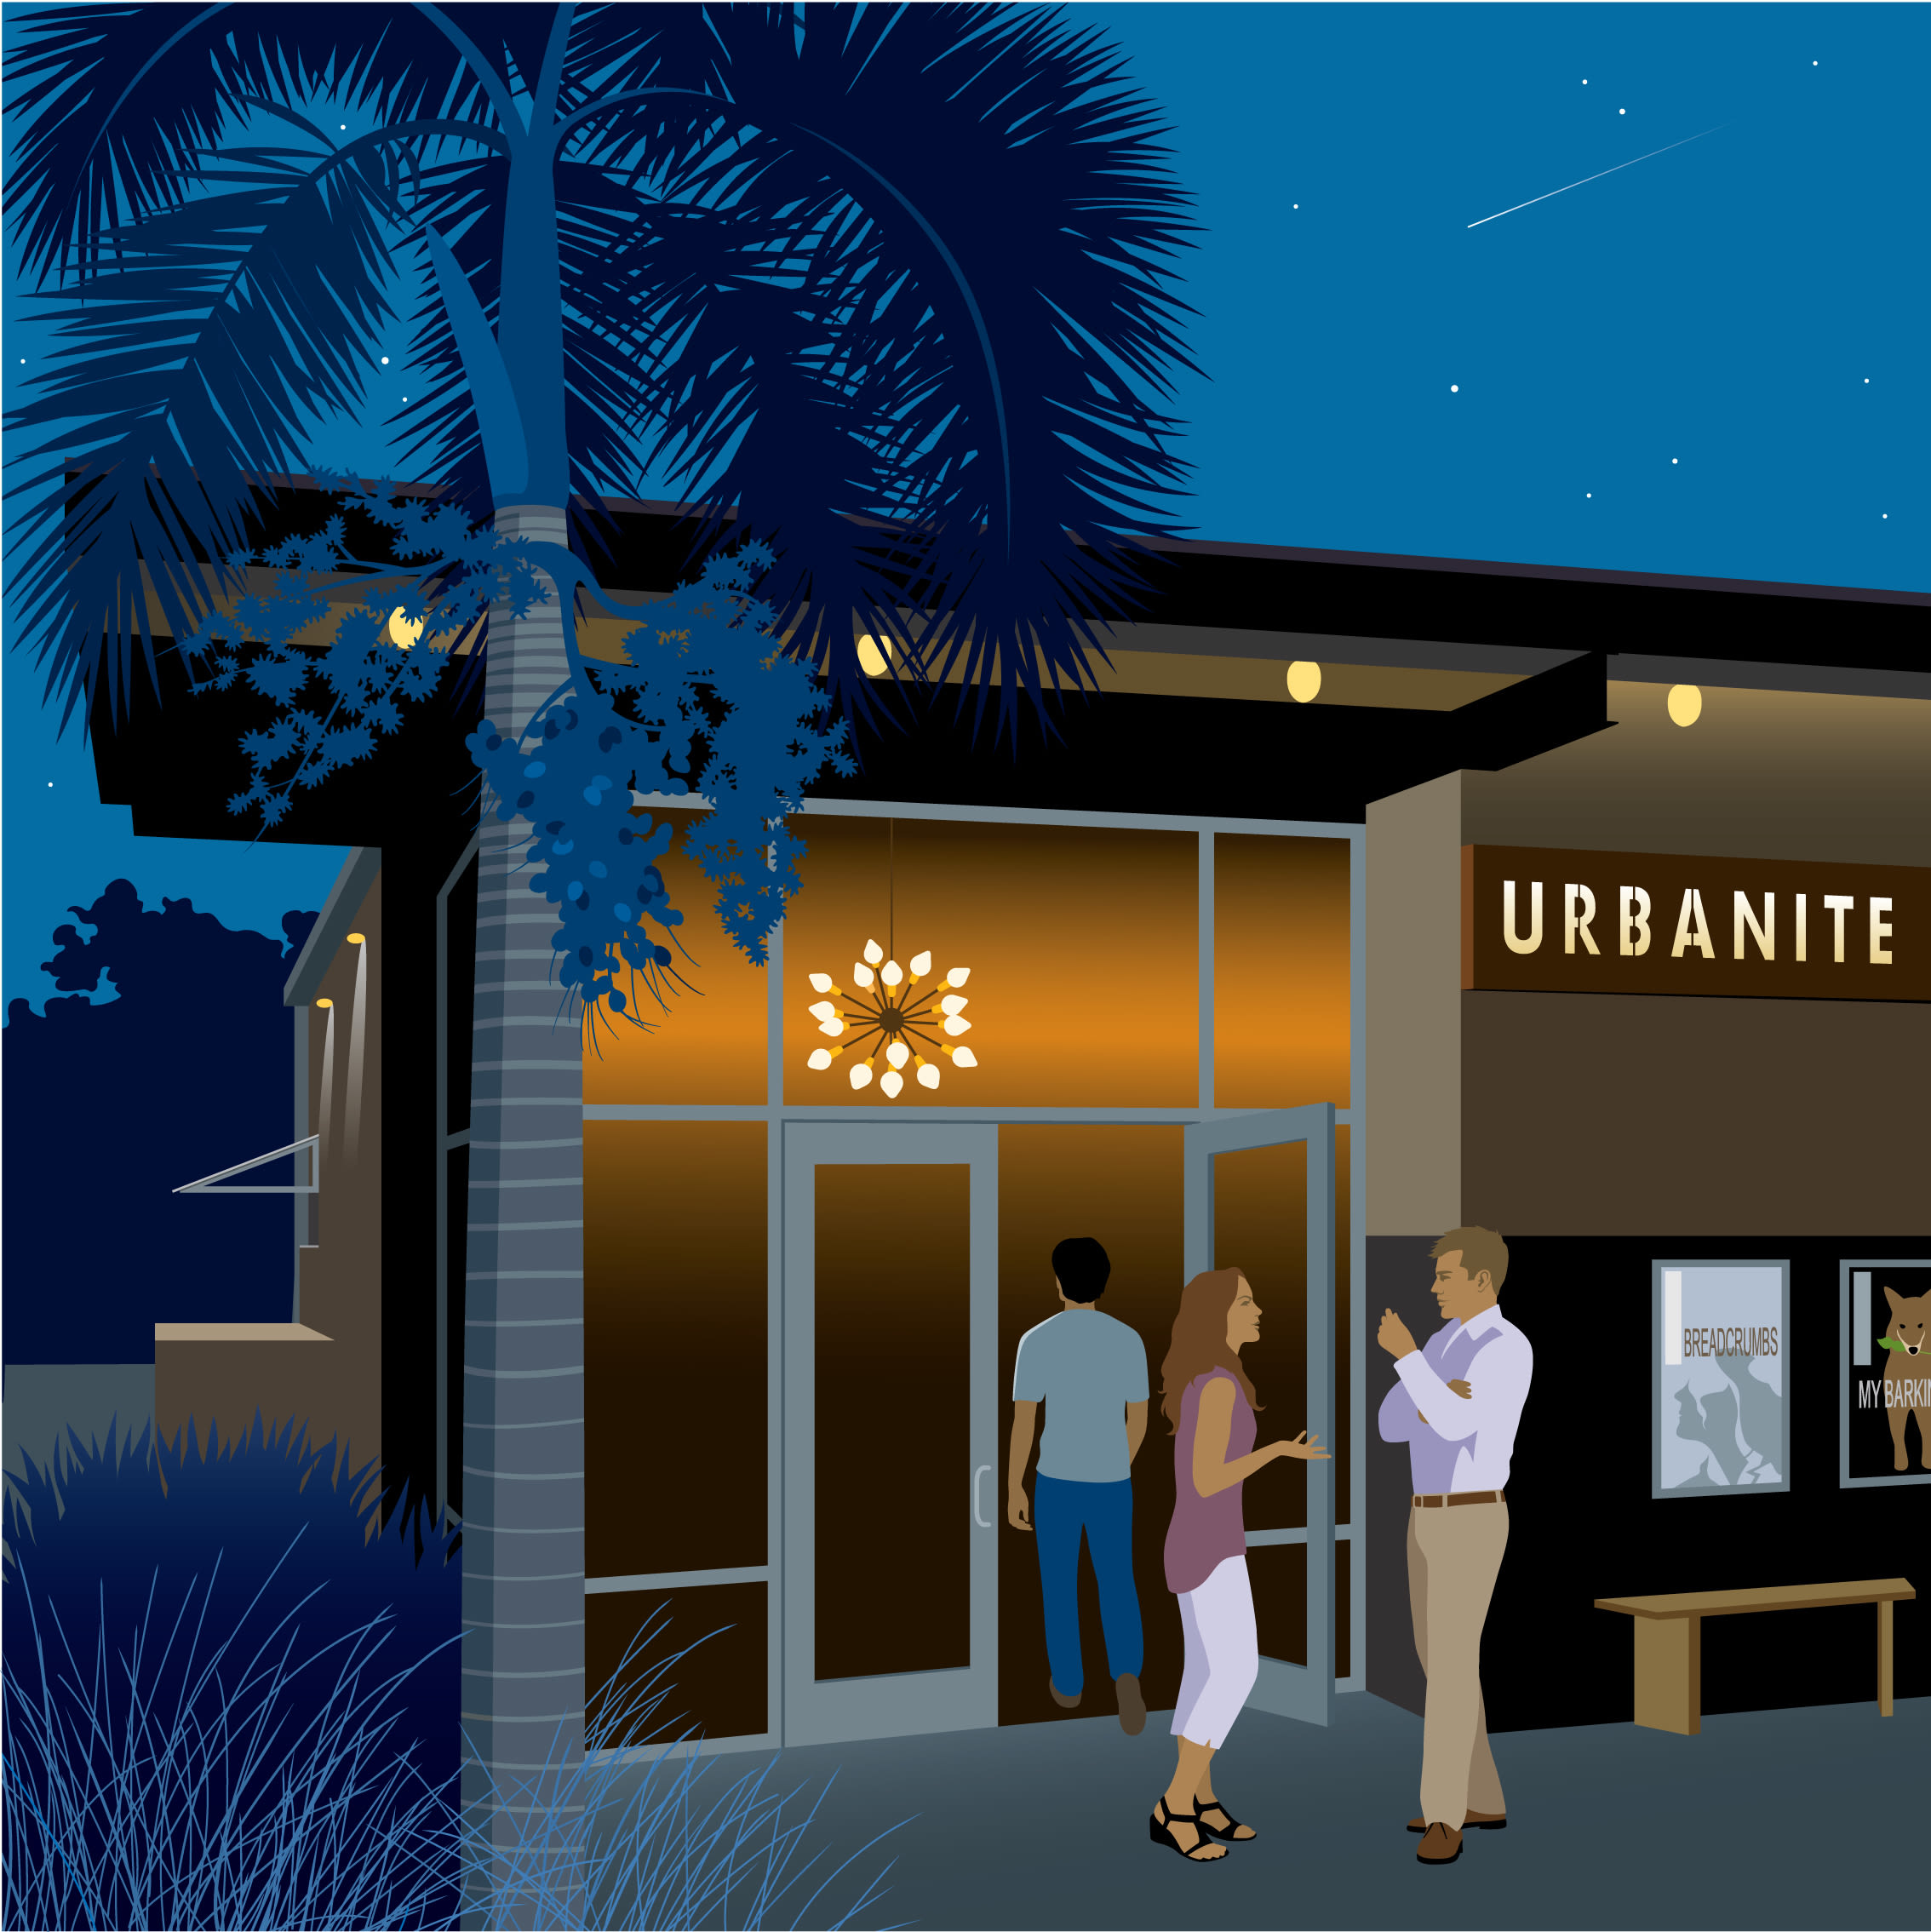 Urbanitetheater zwgwn1